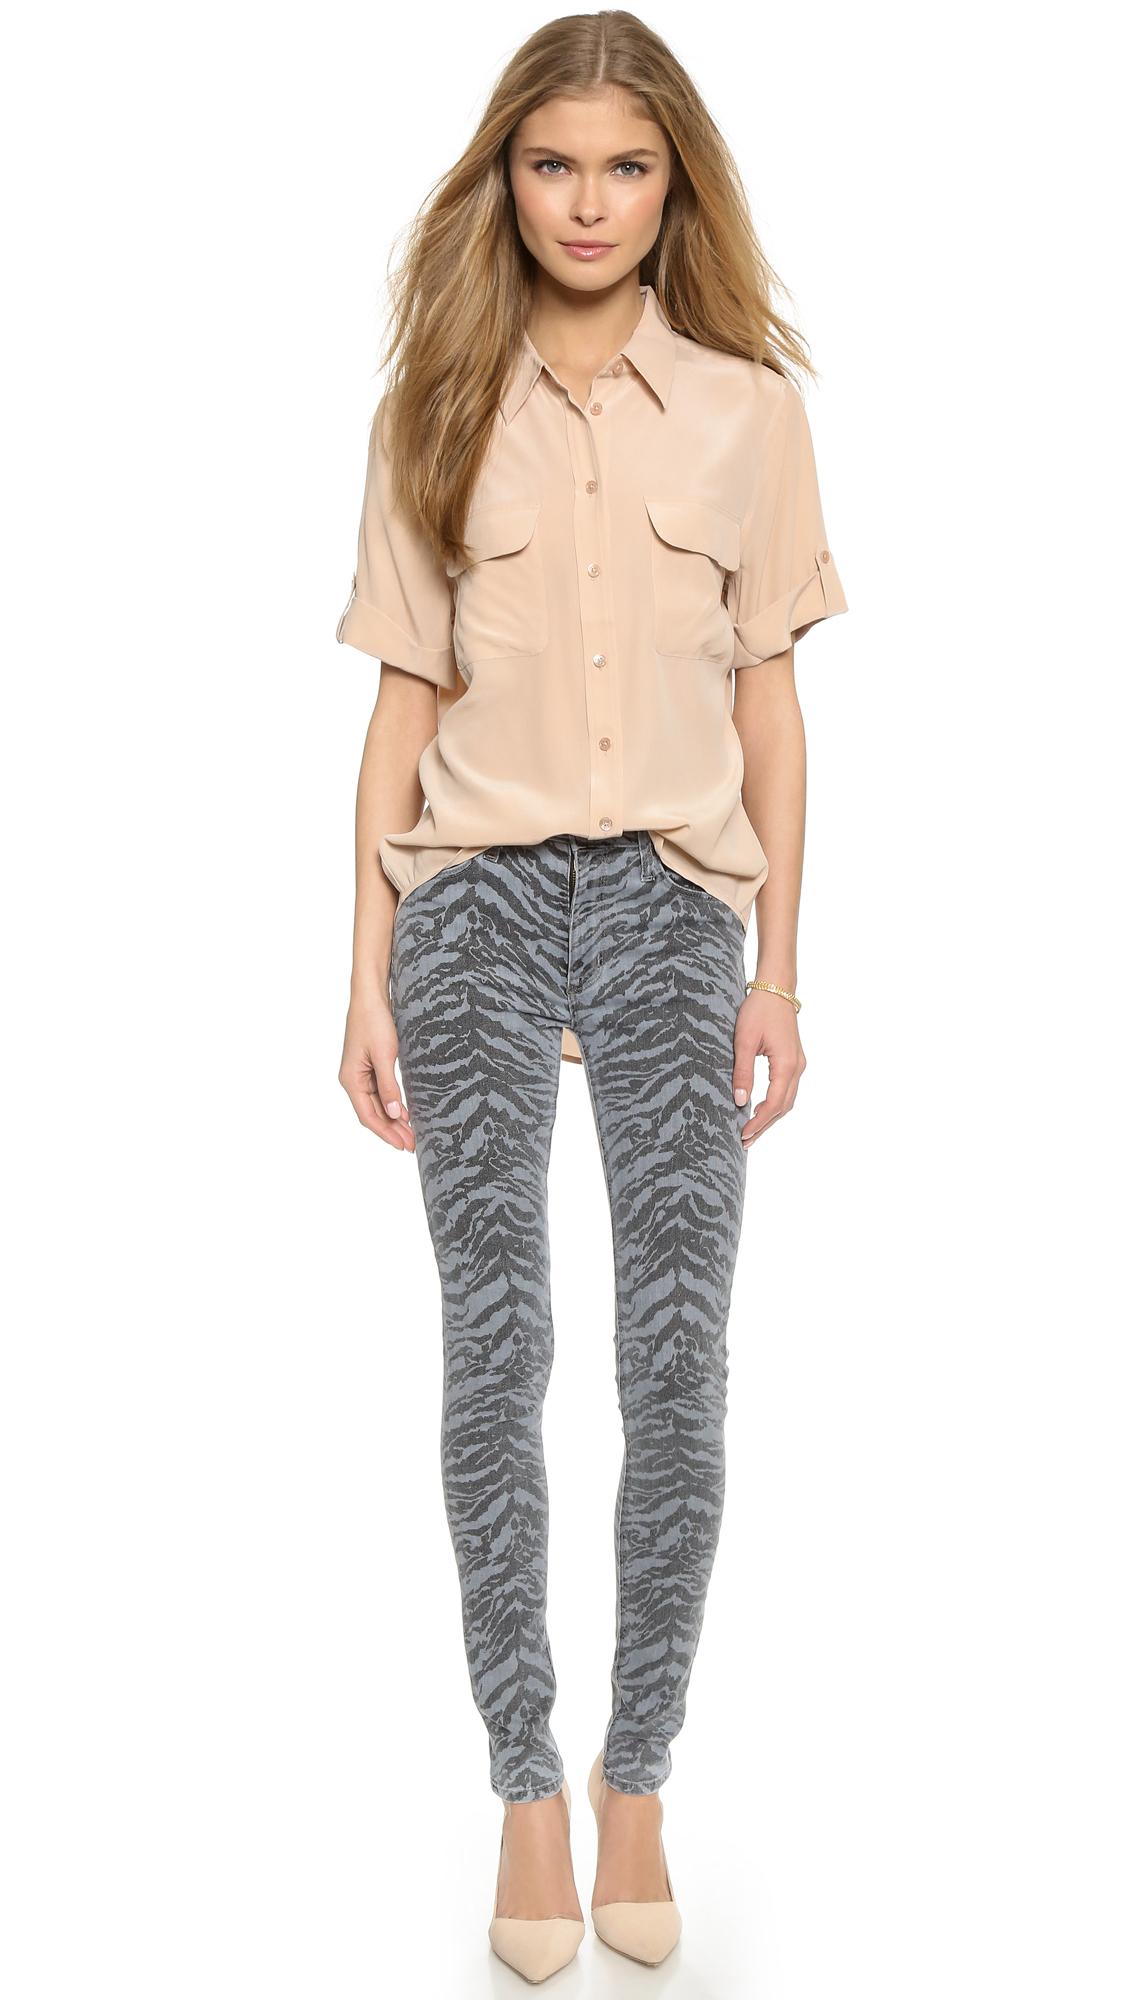 Hudson Jeans Barbara High Waisted Super Skinny Jeans